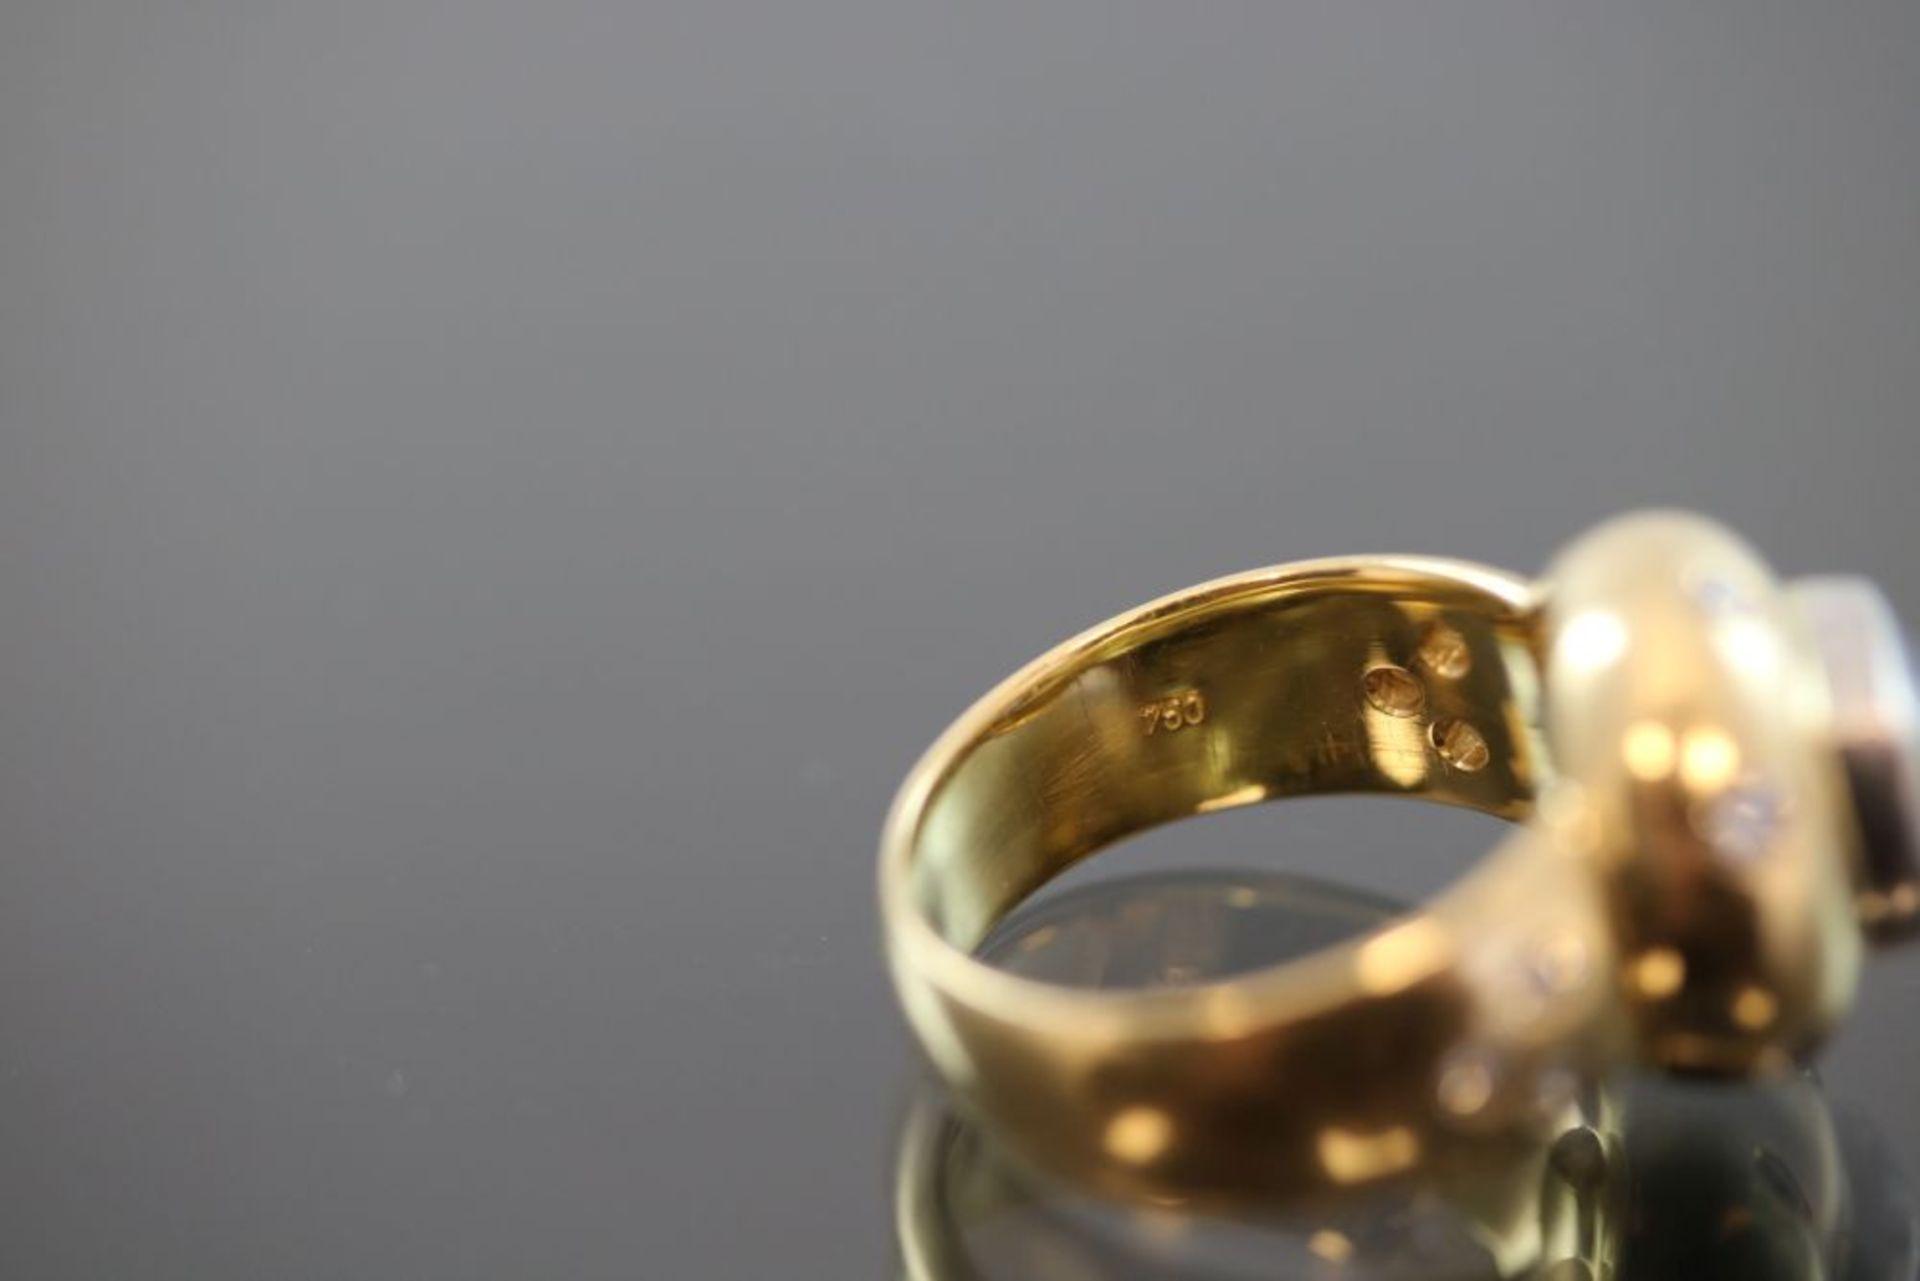 Tanzanit-Brillant-Ring, 750 Gold - Bild 3 aus 3